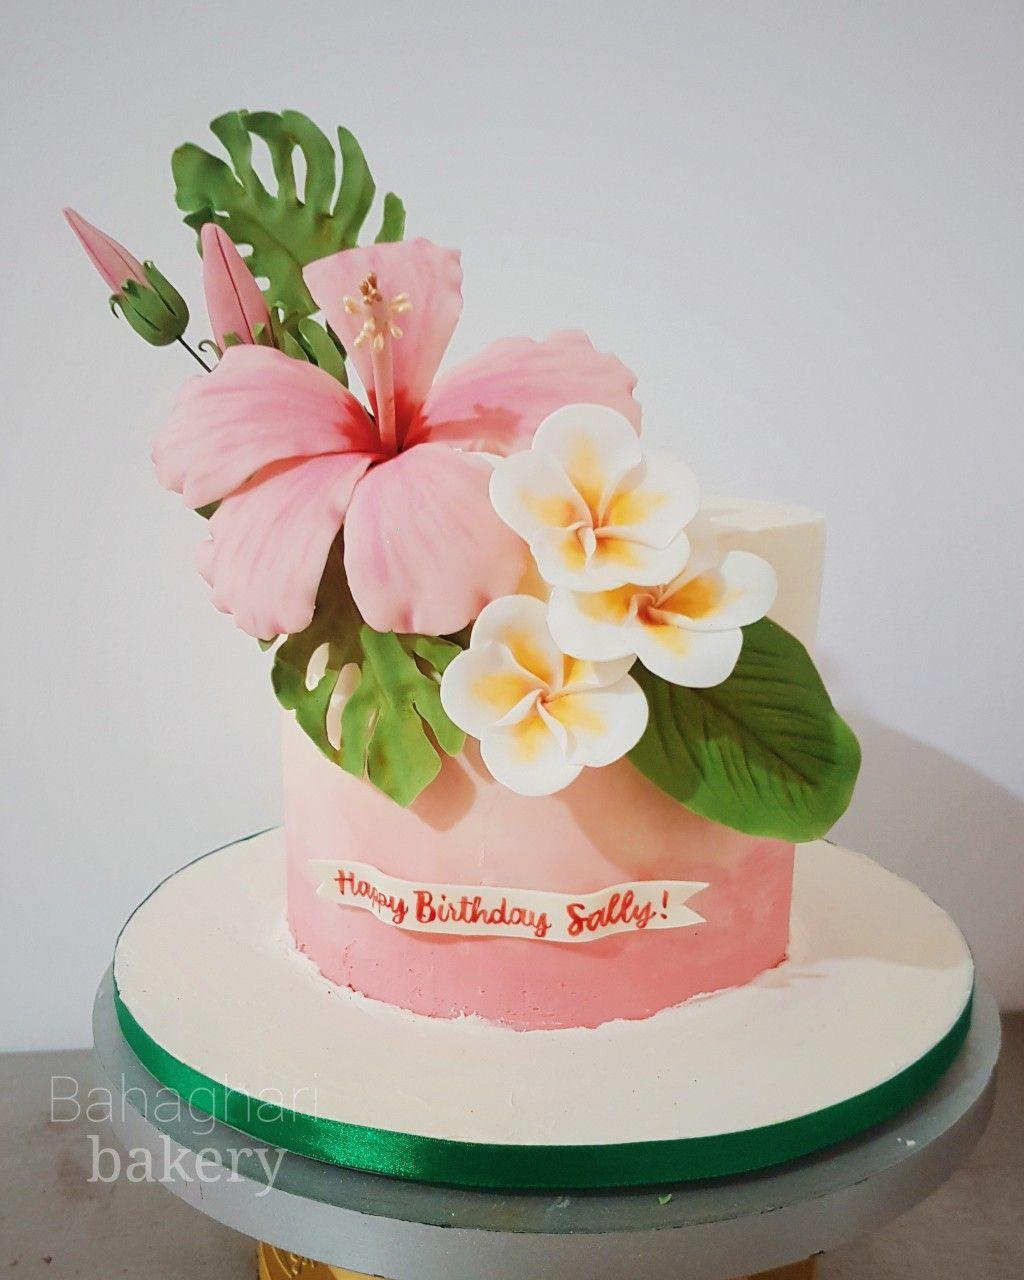 Minimalist Tropical Theme Cake In 2020 Birthday Cake With Flowers Hawaiian Wedding Cake Hibiscus Cake